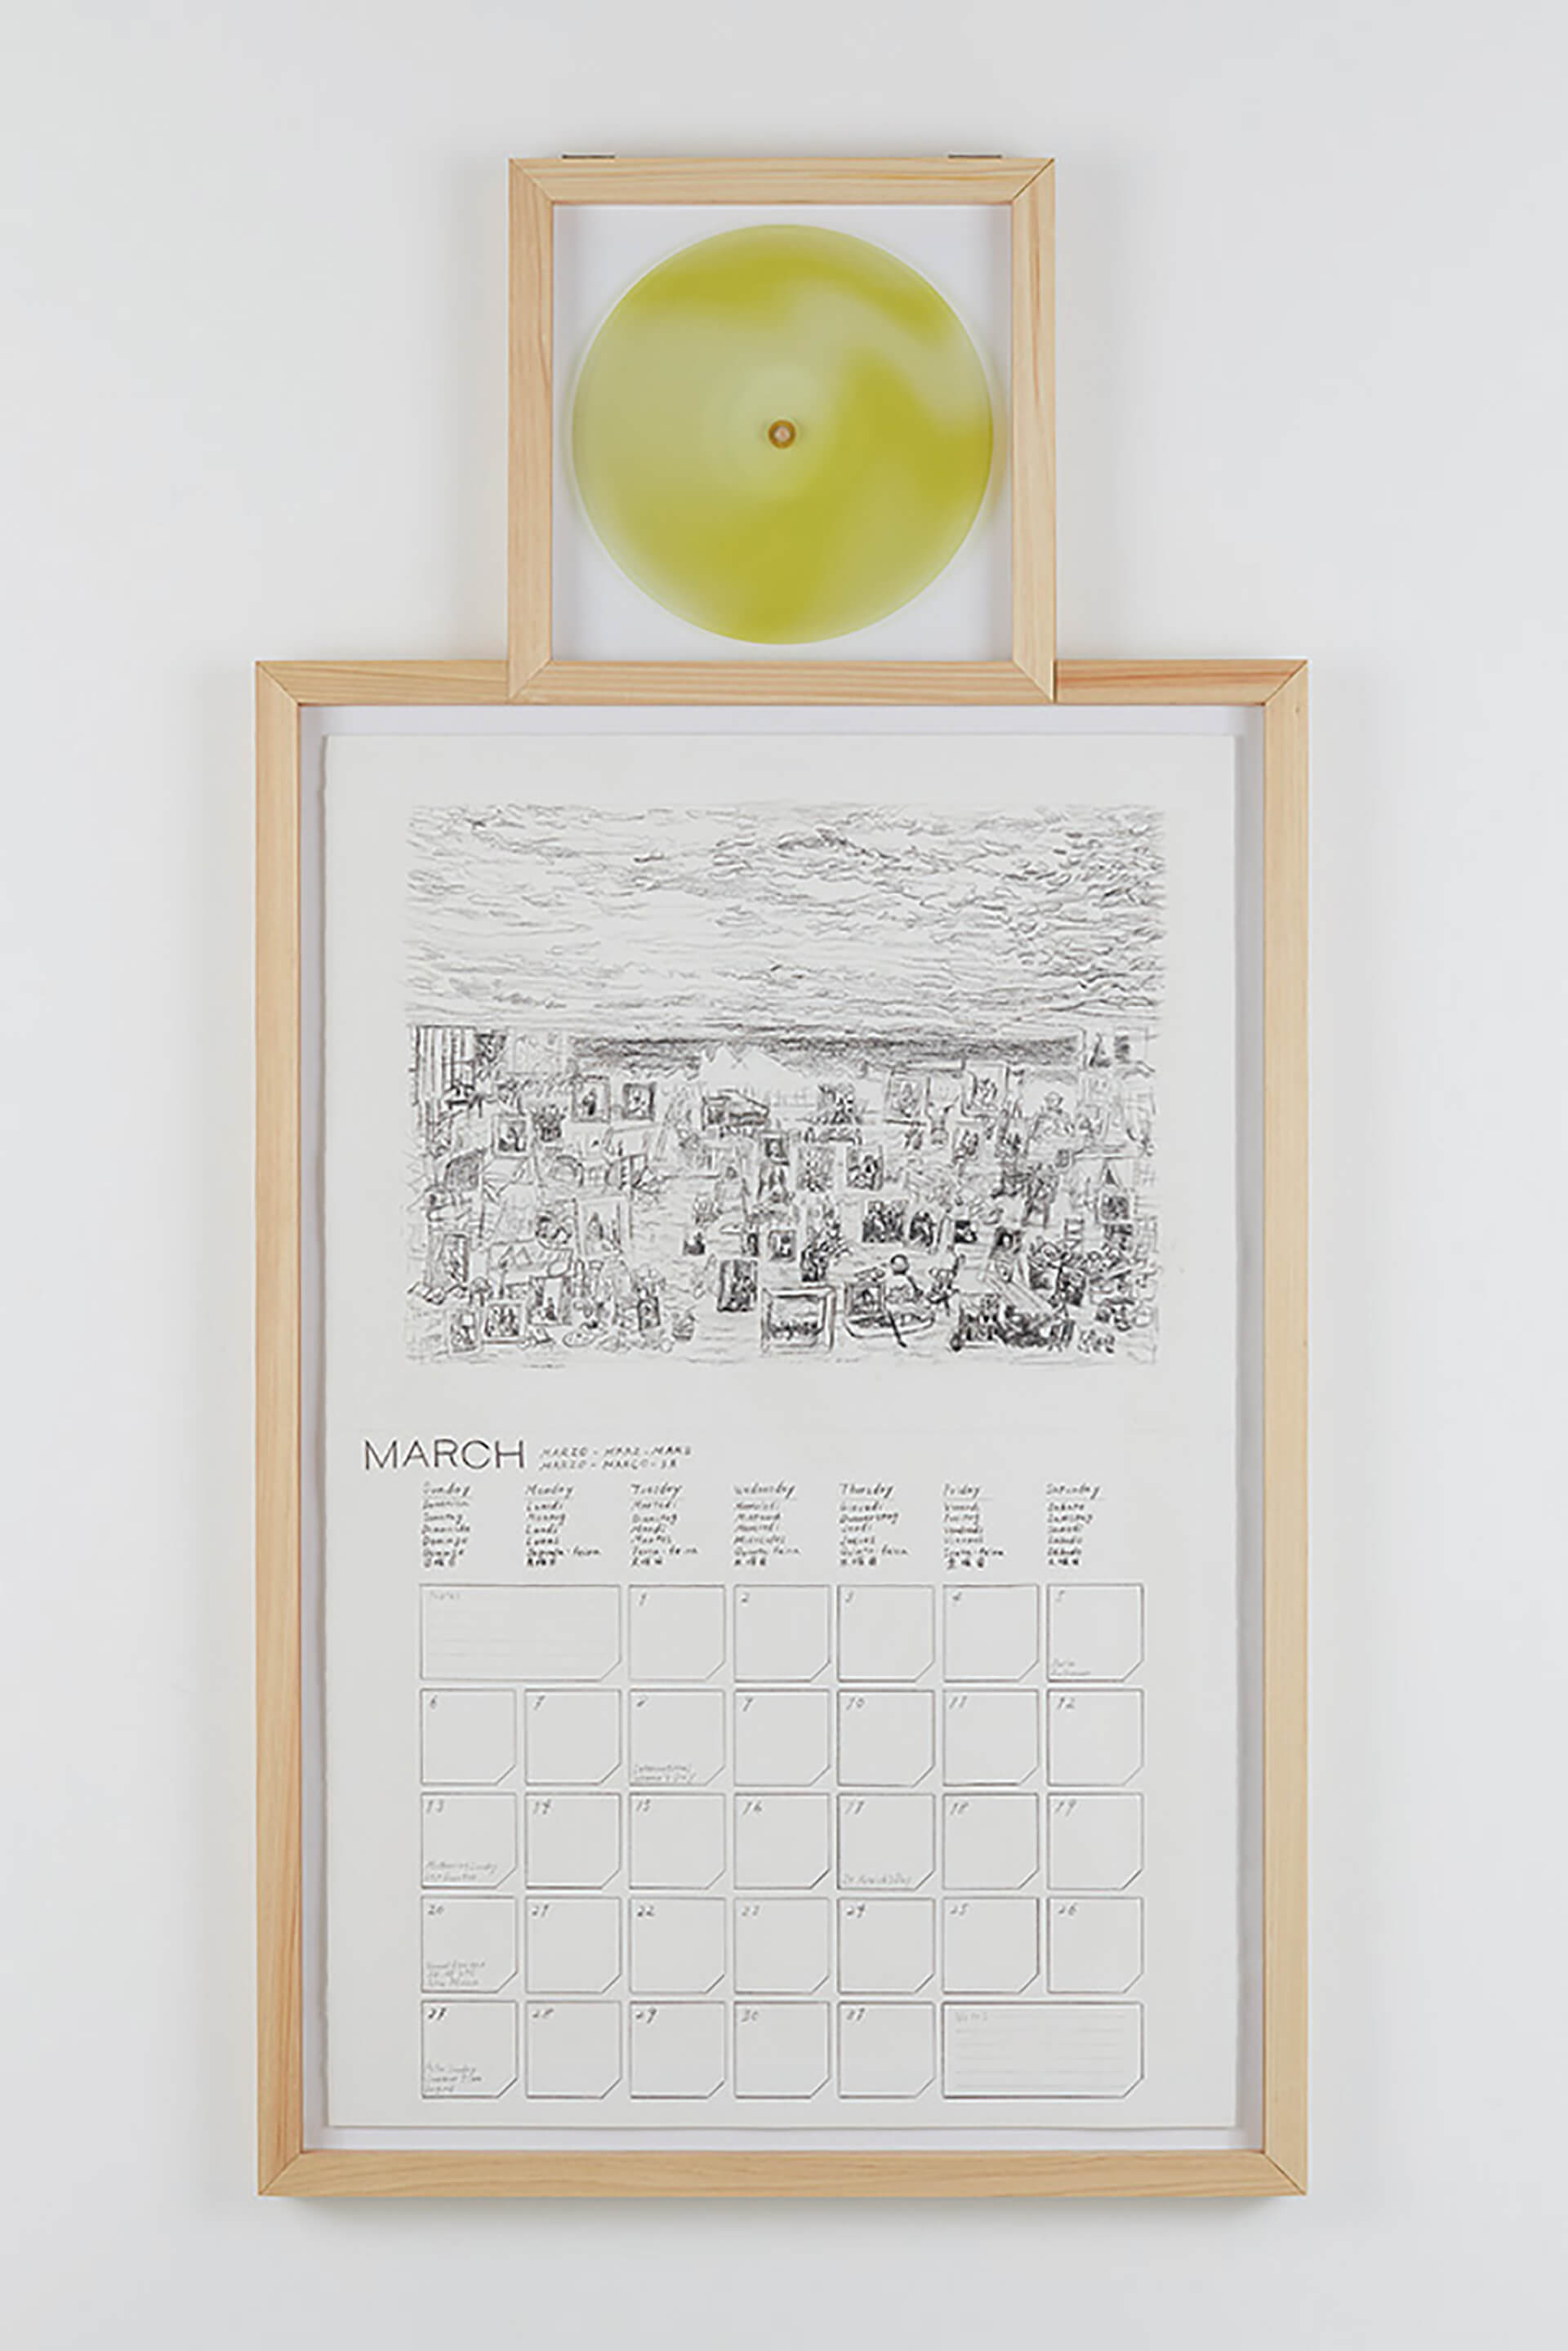 桑久保 徹 A Calendar for Painters without Time Sense. 12/12